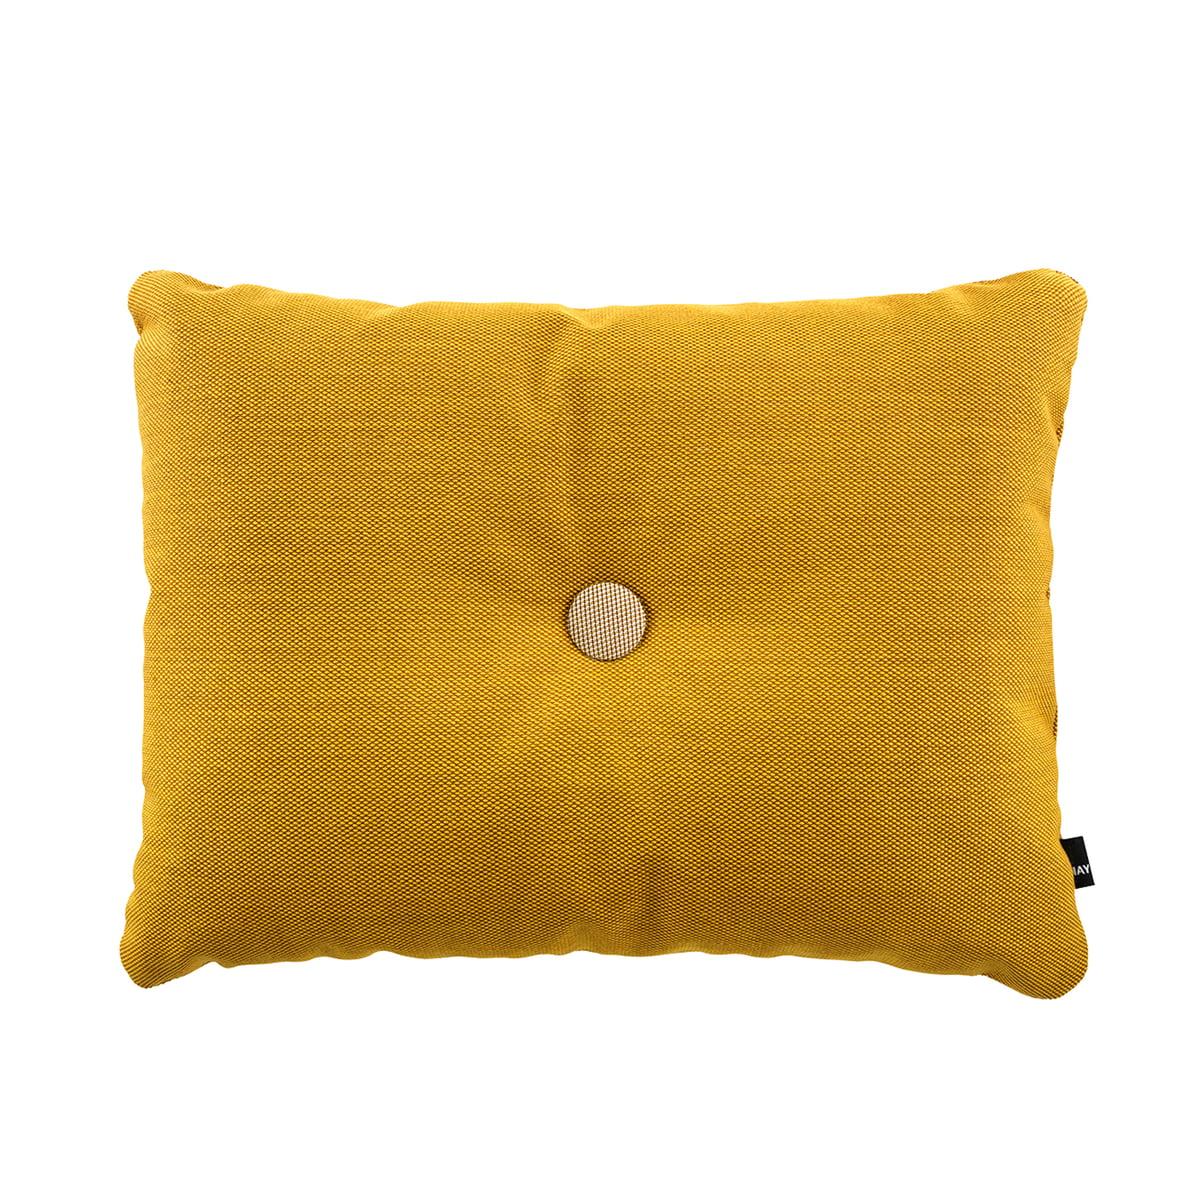 Hay kissen dot 45 x 60 cm steelcut trio golden yellow 453 neu